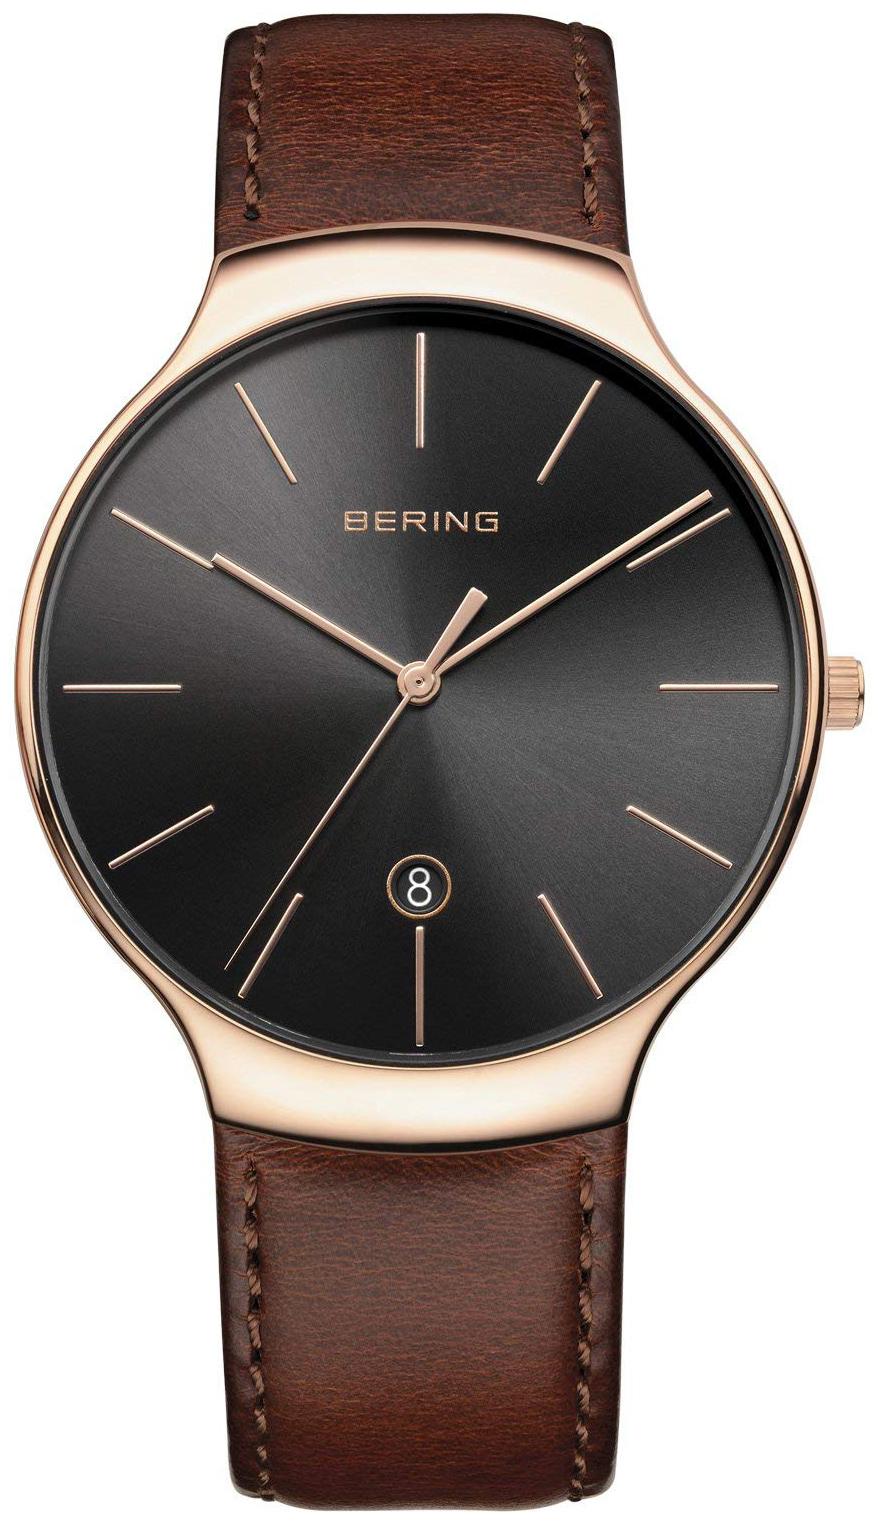 Bering Classic 13338-562 Sort/Lær Ø38 mm - Bering